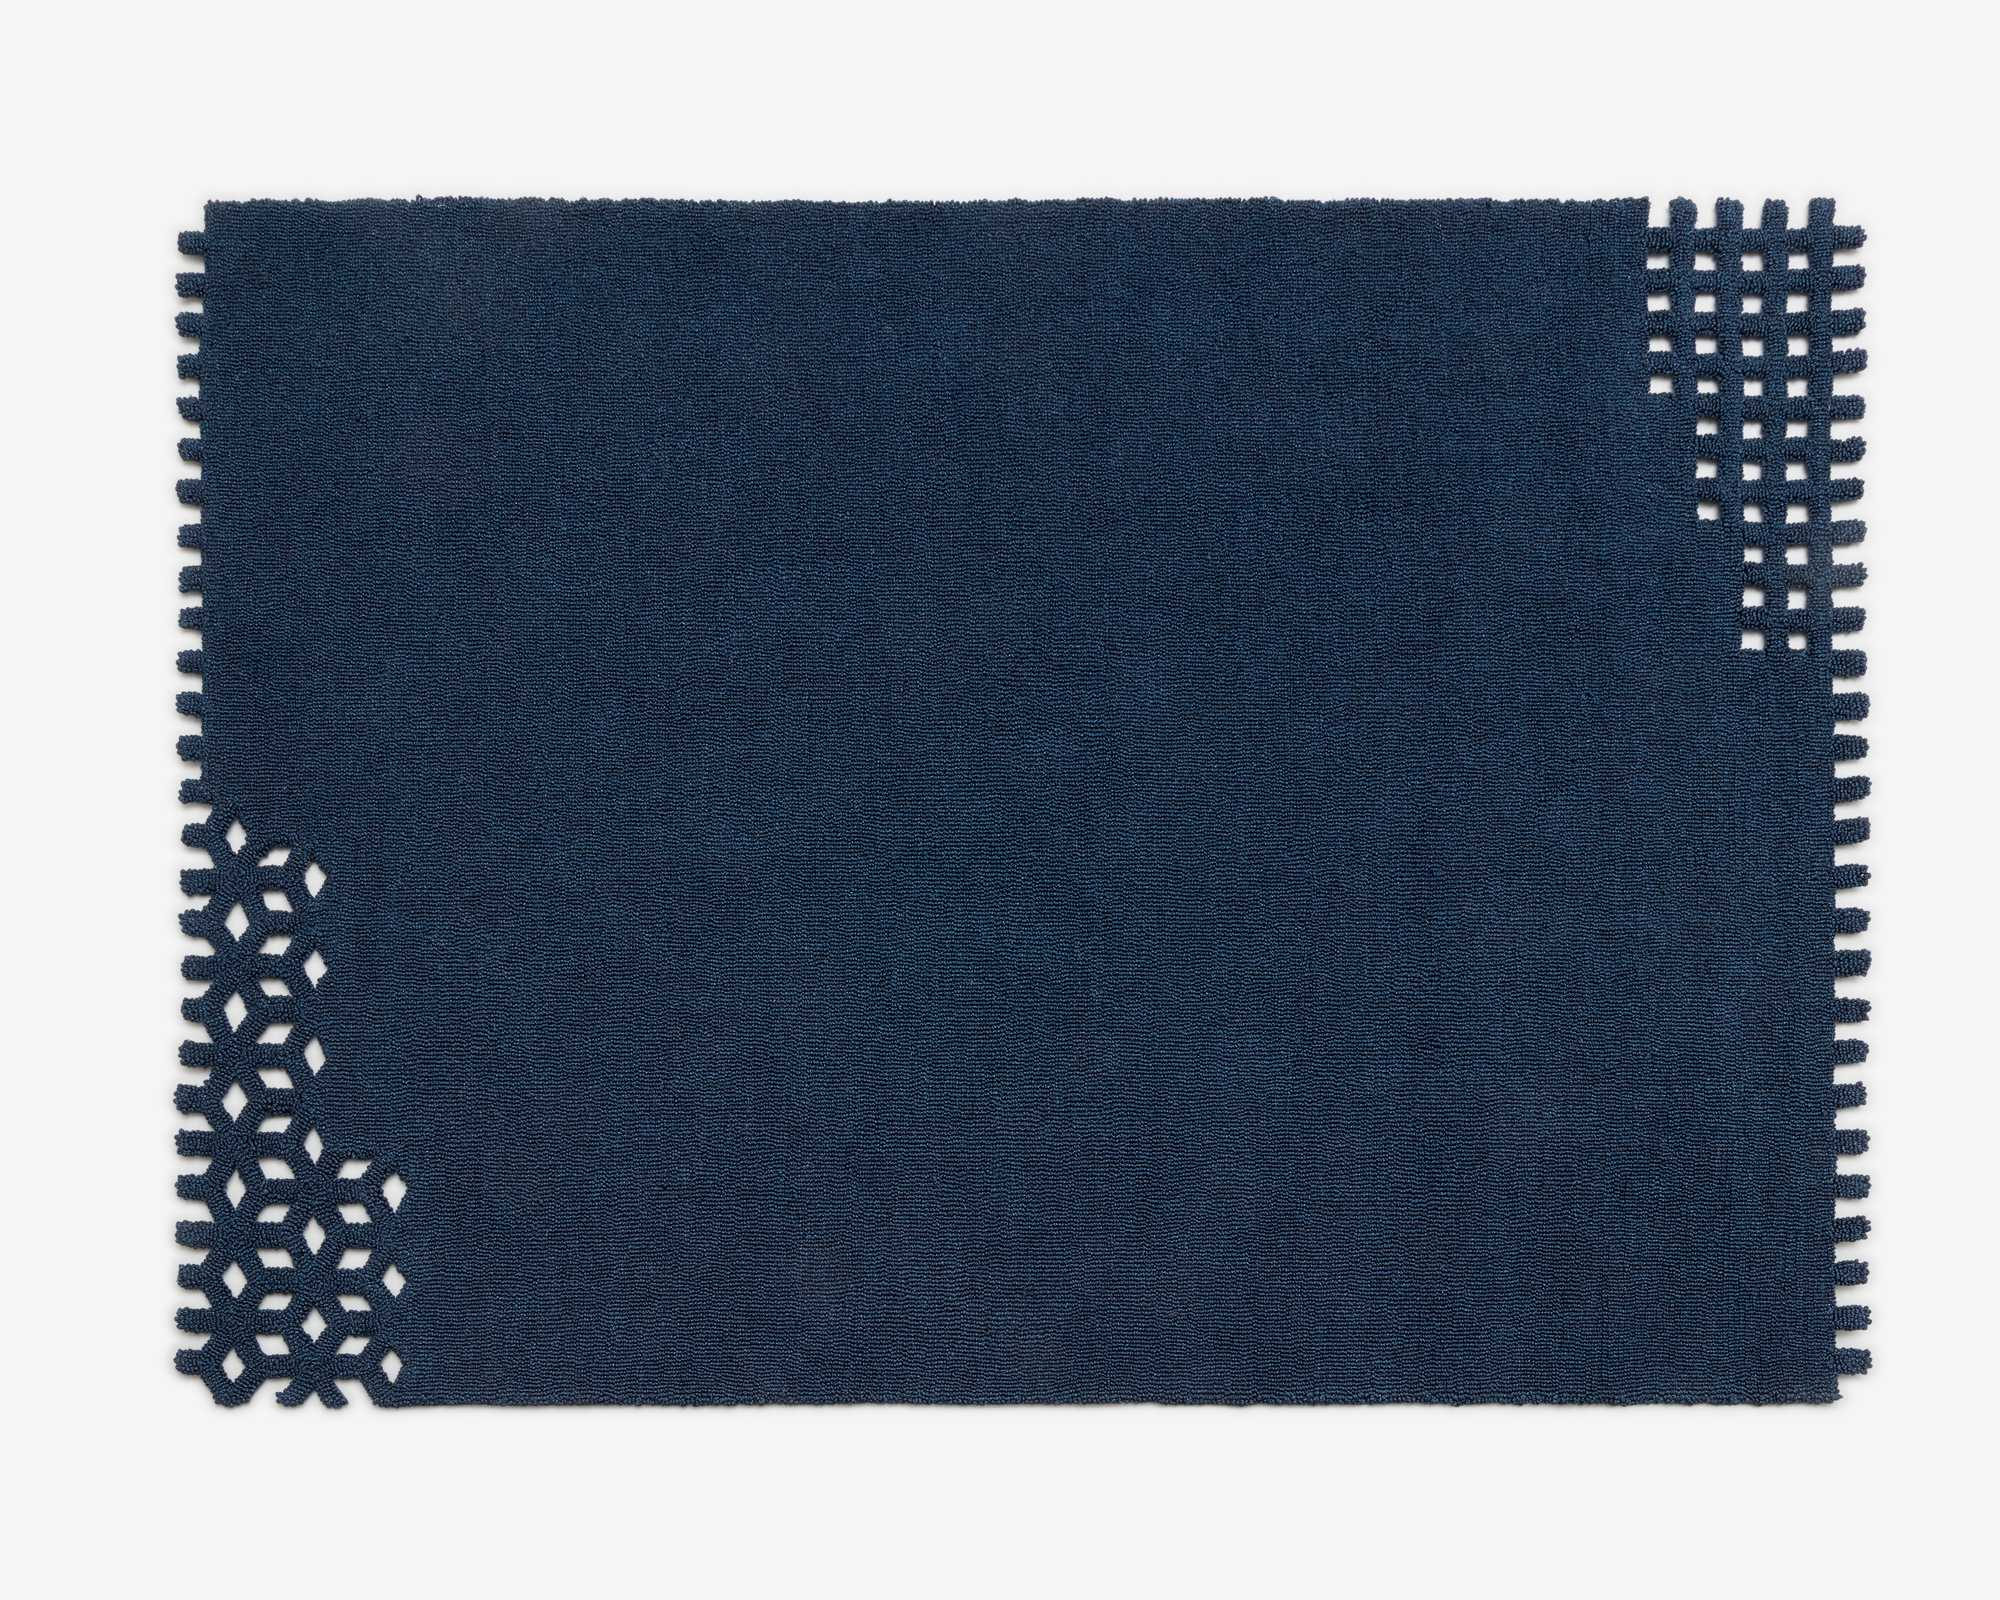 CROSS BORDERC0780full size rug copy